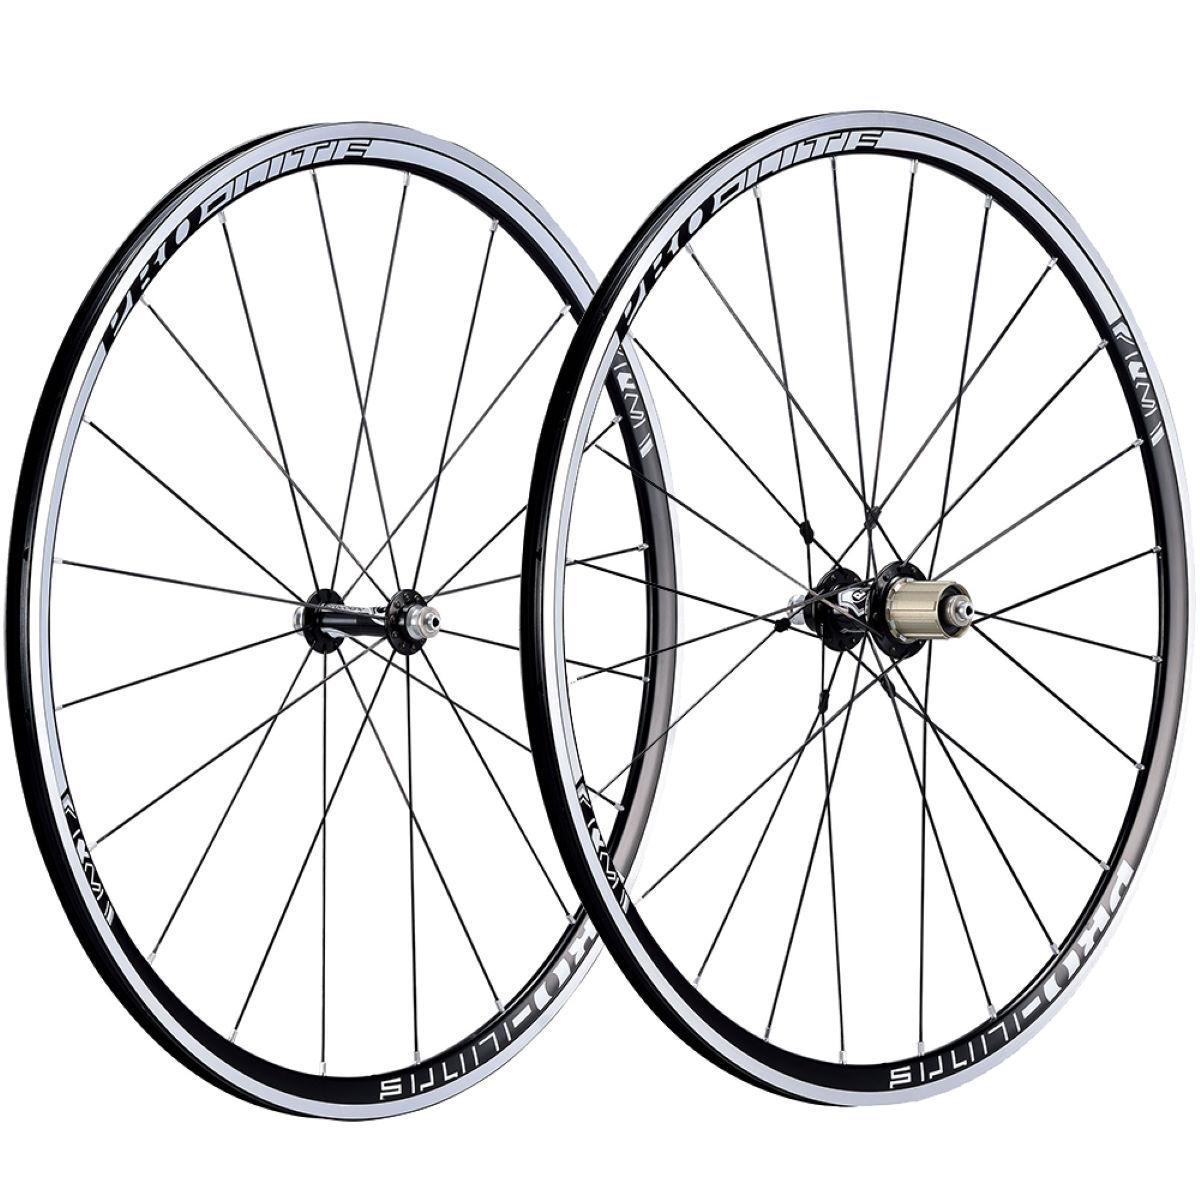 Pro Lite Bracciano 650C 24mm Alloy Clincher Wheelset Performance Wheels